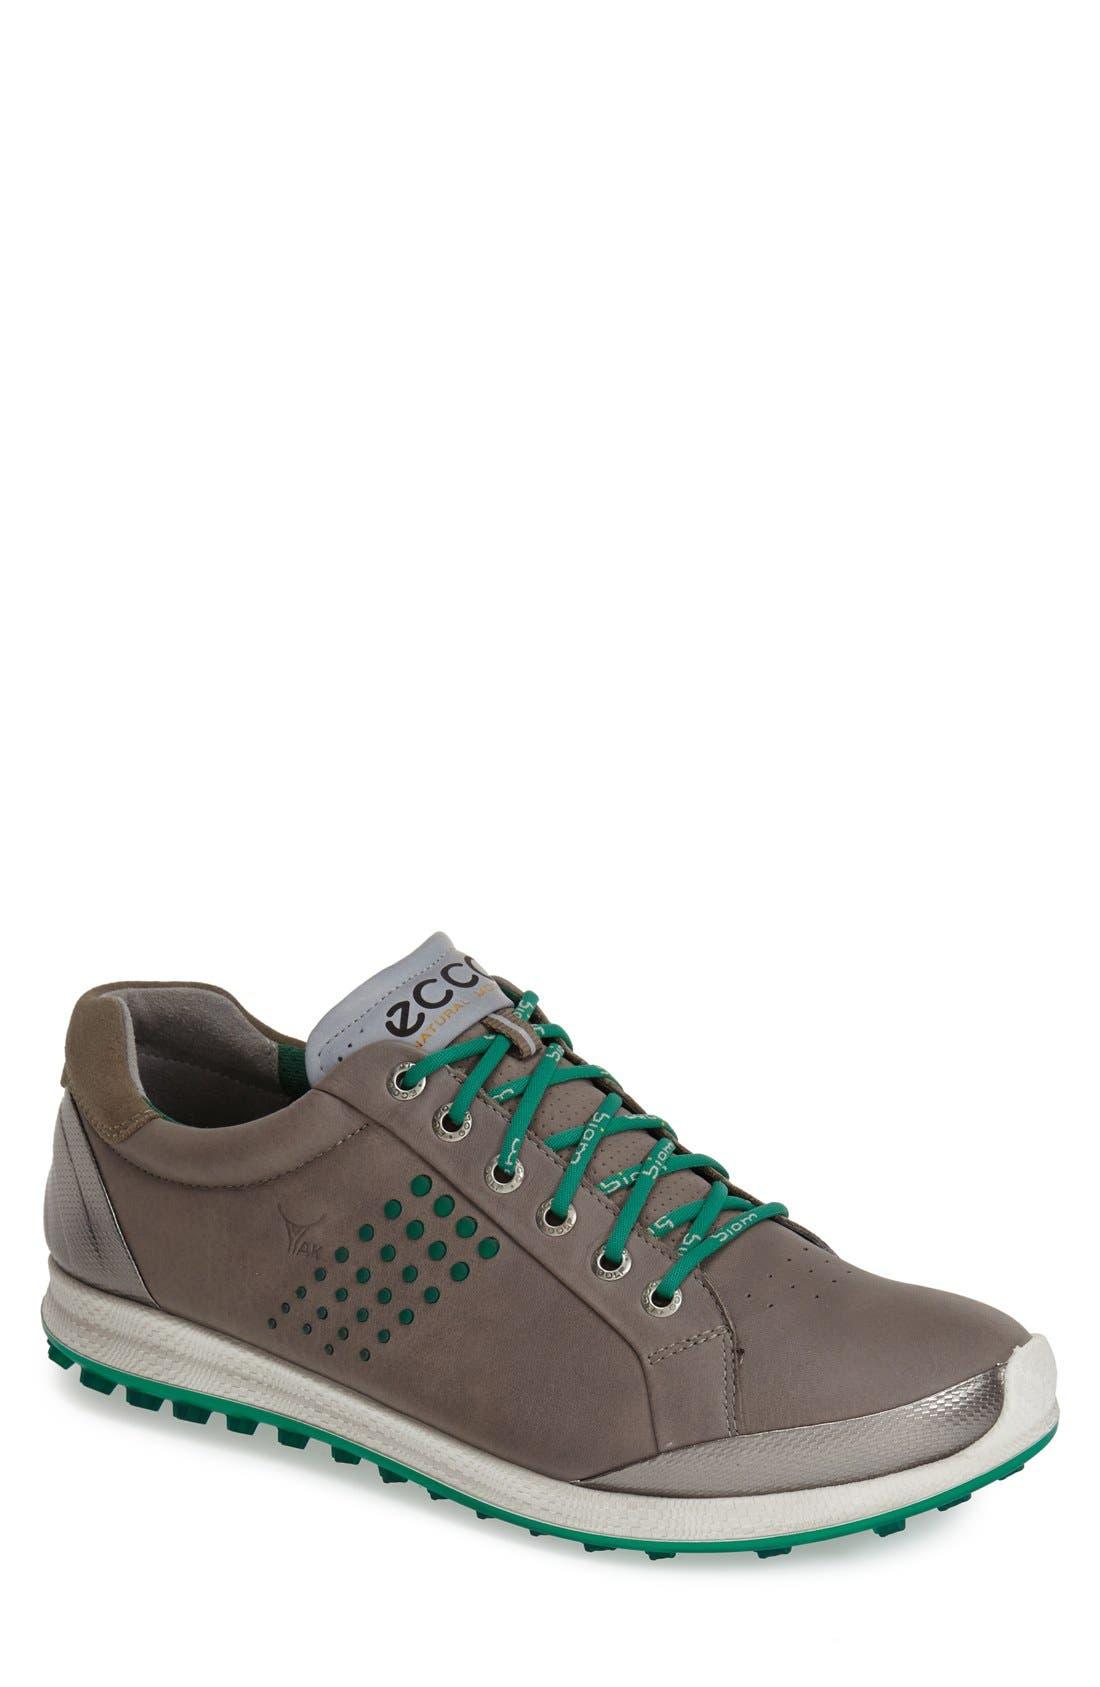 BIOM Hybrid 2 Golf Shoe,                             Main thumbnail 1, color,                             WARM GREY/ GREEN